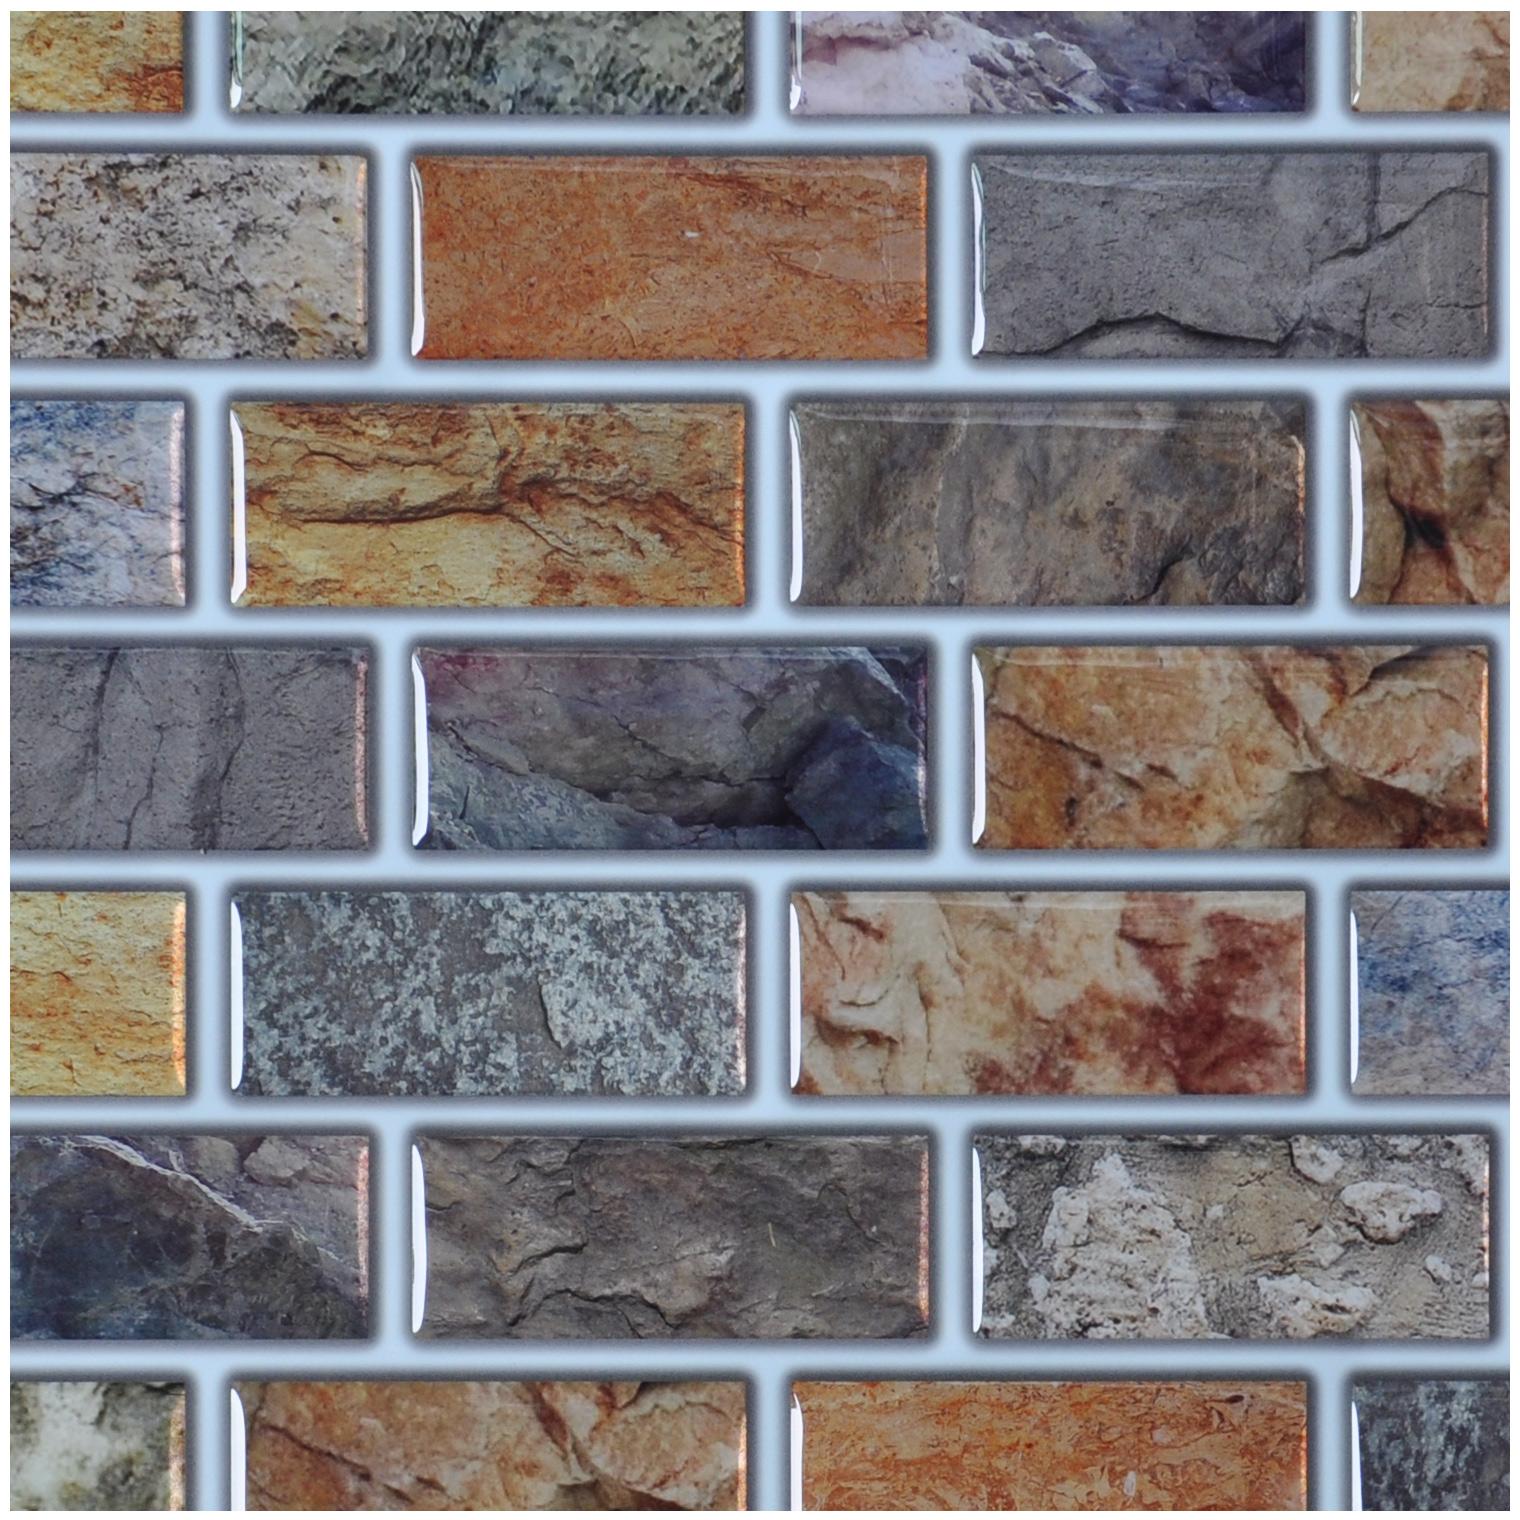 Art3d Peel N Stick Tiles Bathroom Backsplash Tiles 6 Pack 12